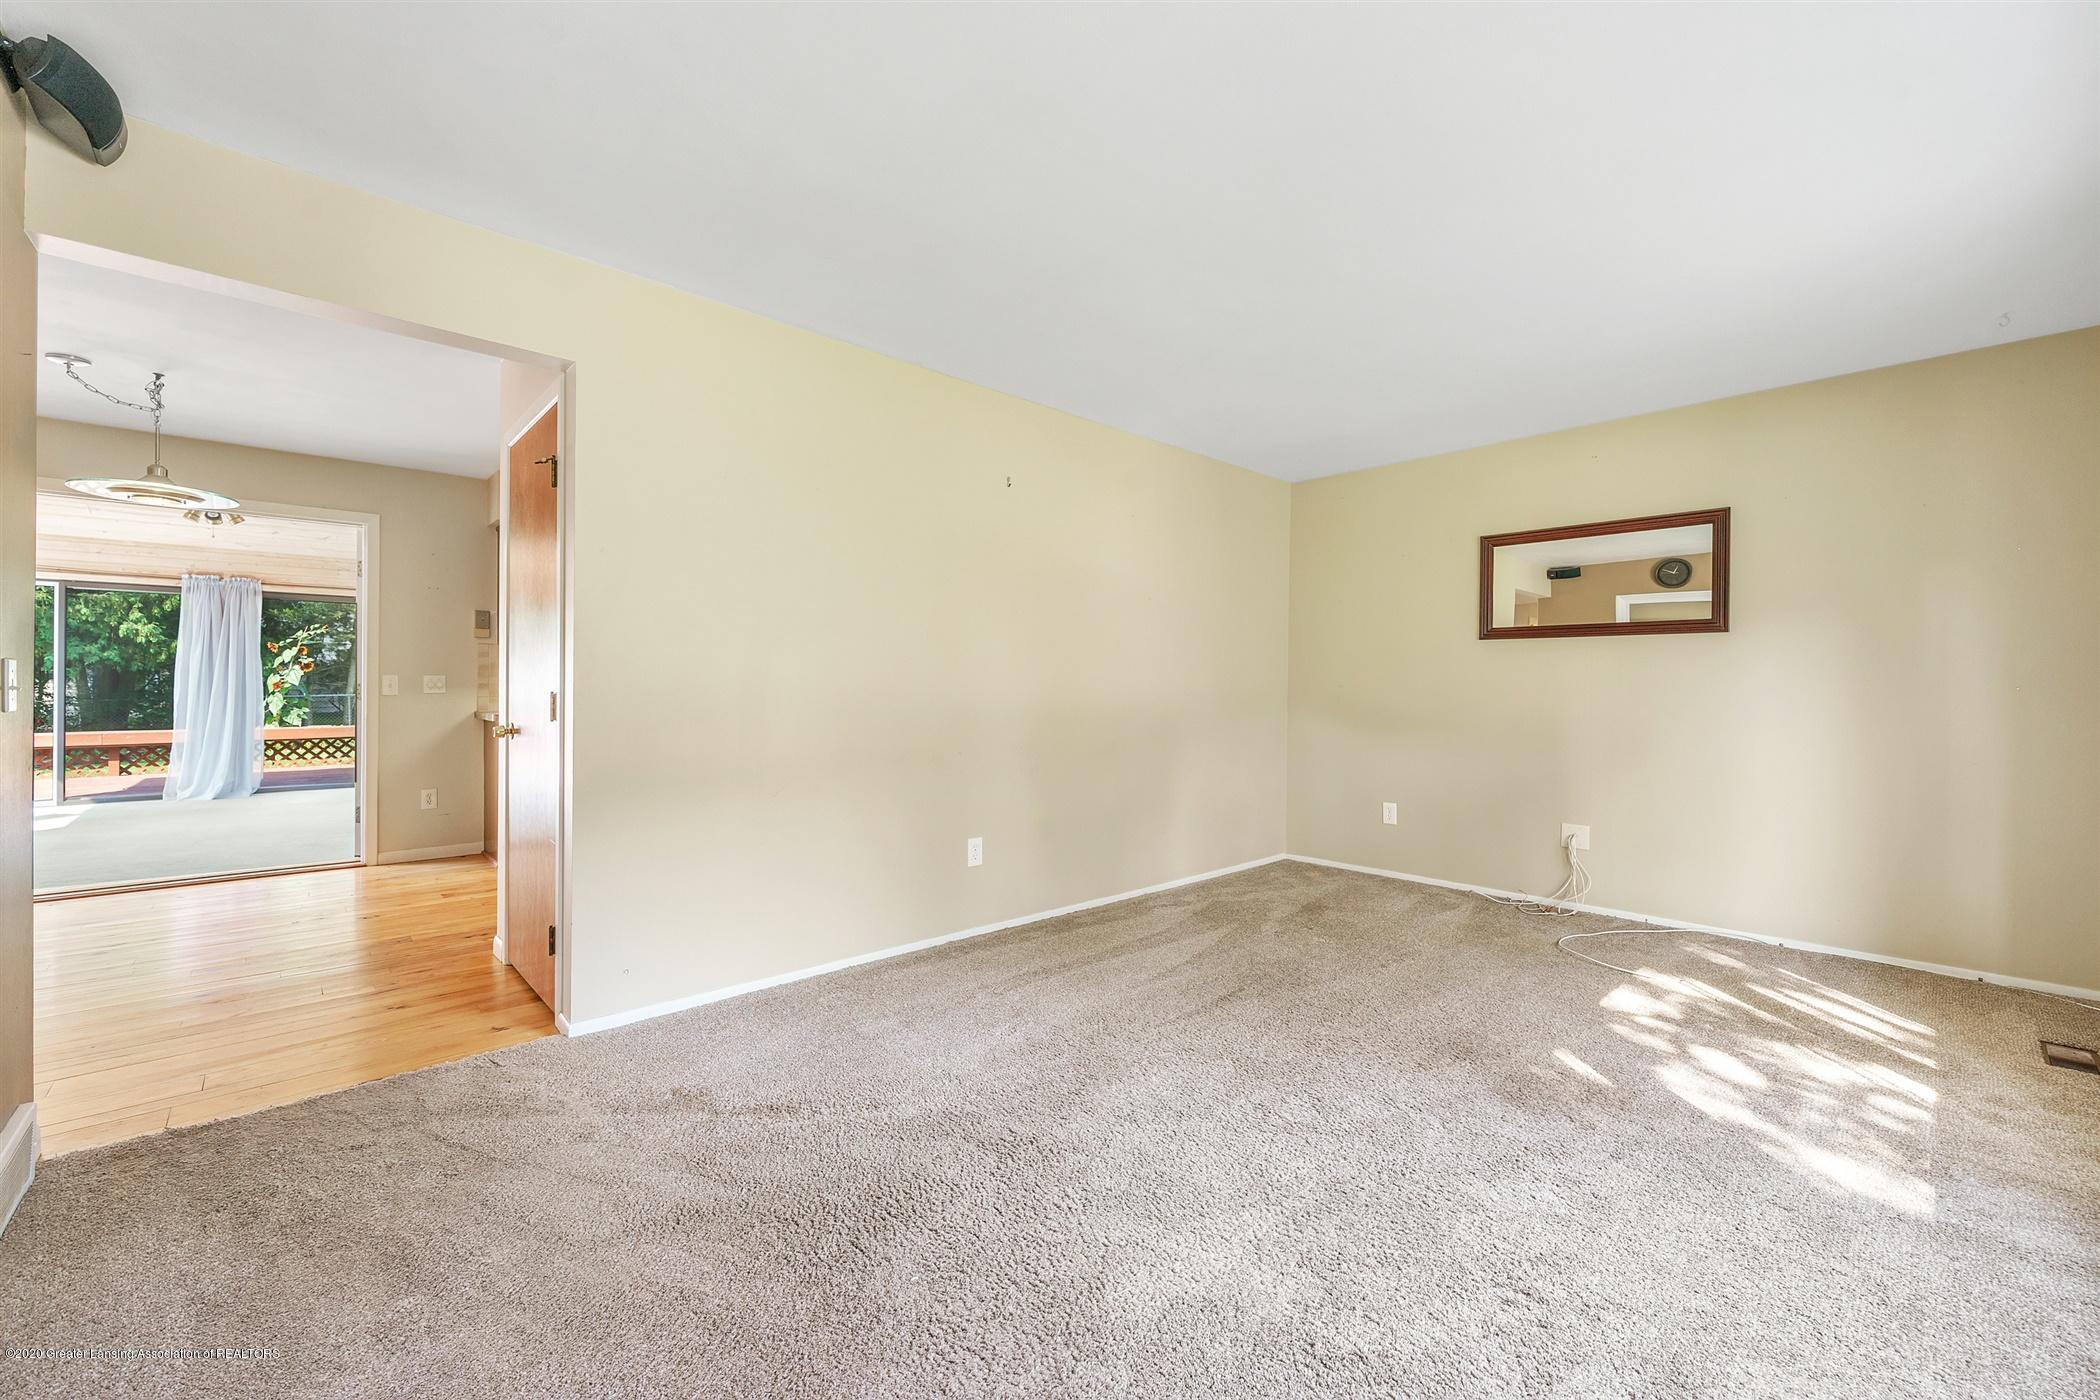 4557 Seneca Dr - (5) MAIN FLOOR Living Room - 5